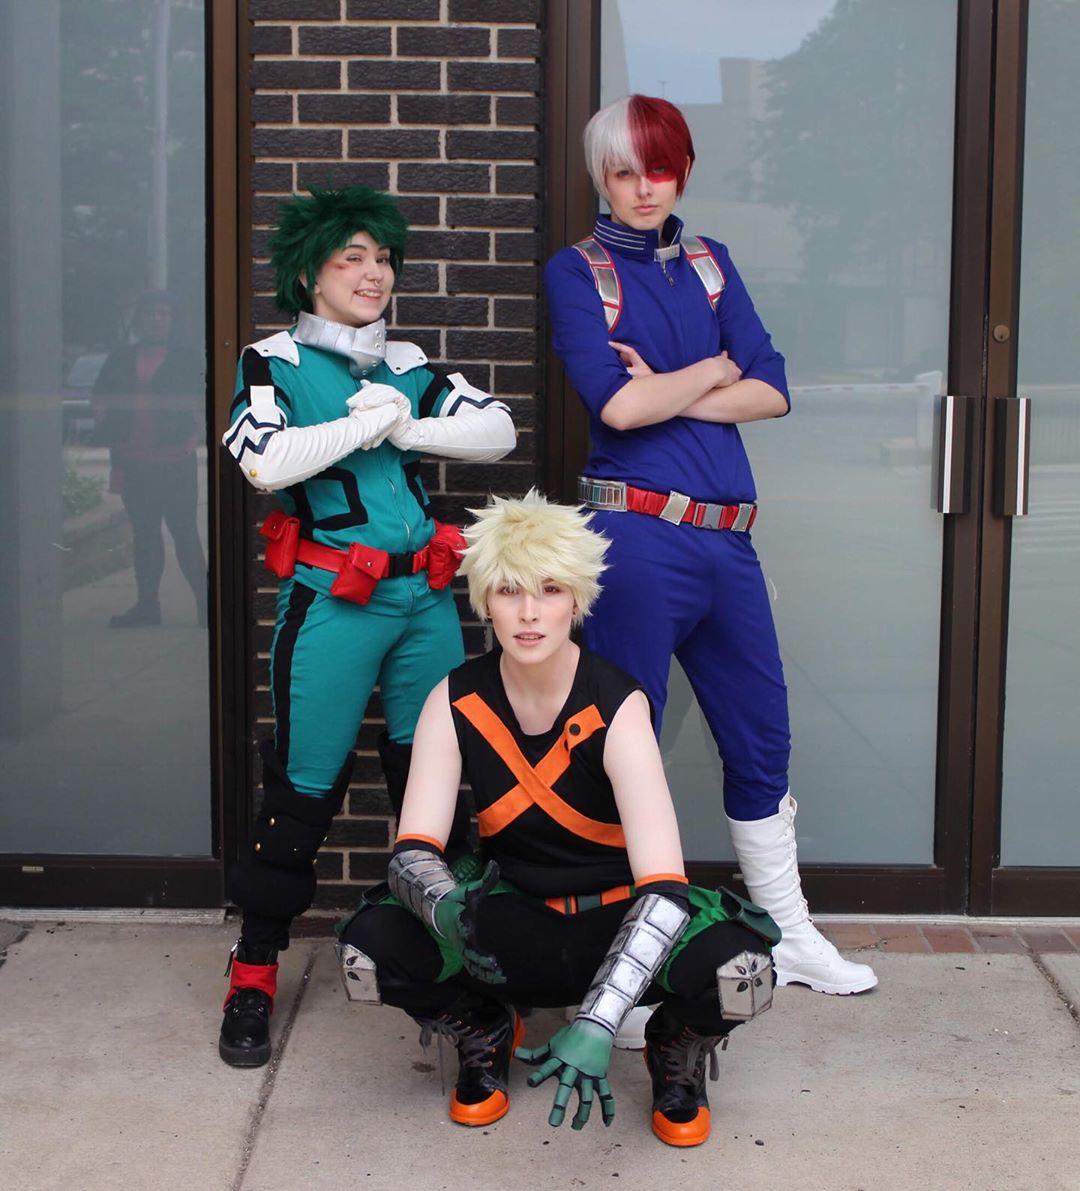 Boku No Hero My Hero Academia Shoto Todoroki Hero Costume Cosplay Costume Uniform